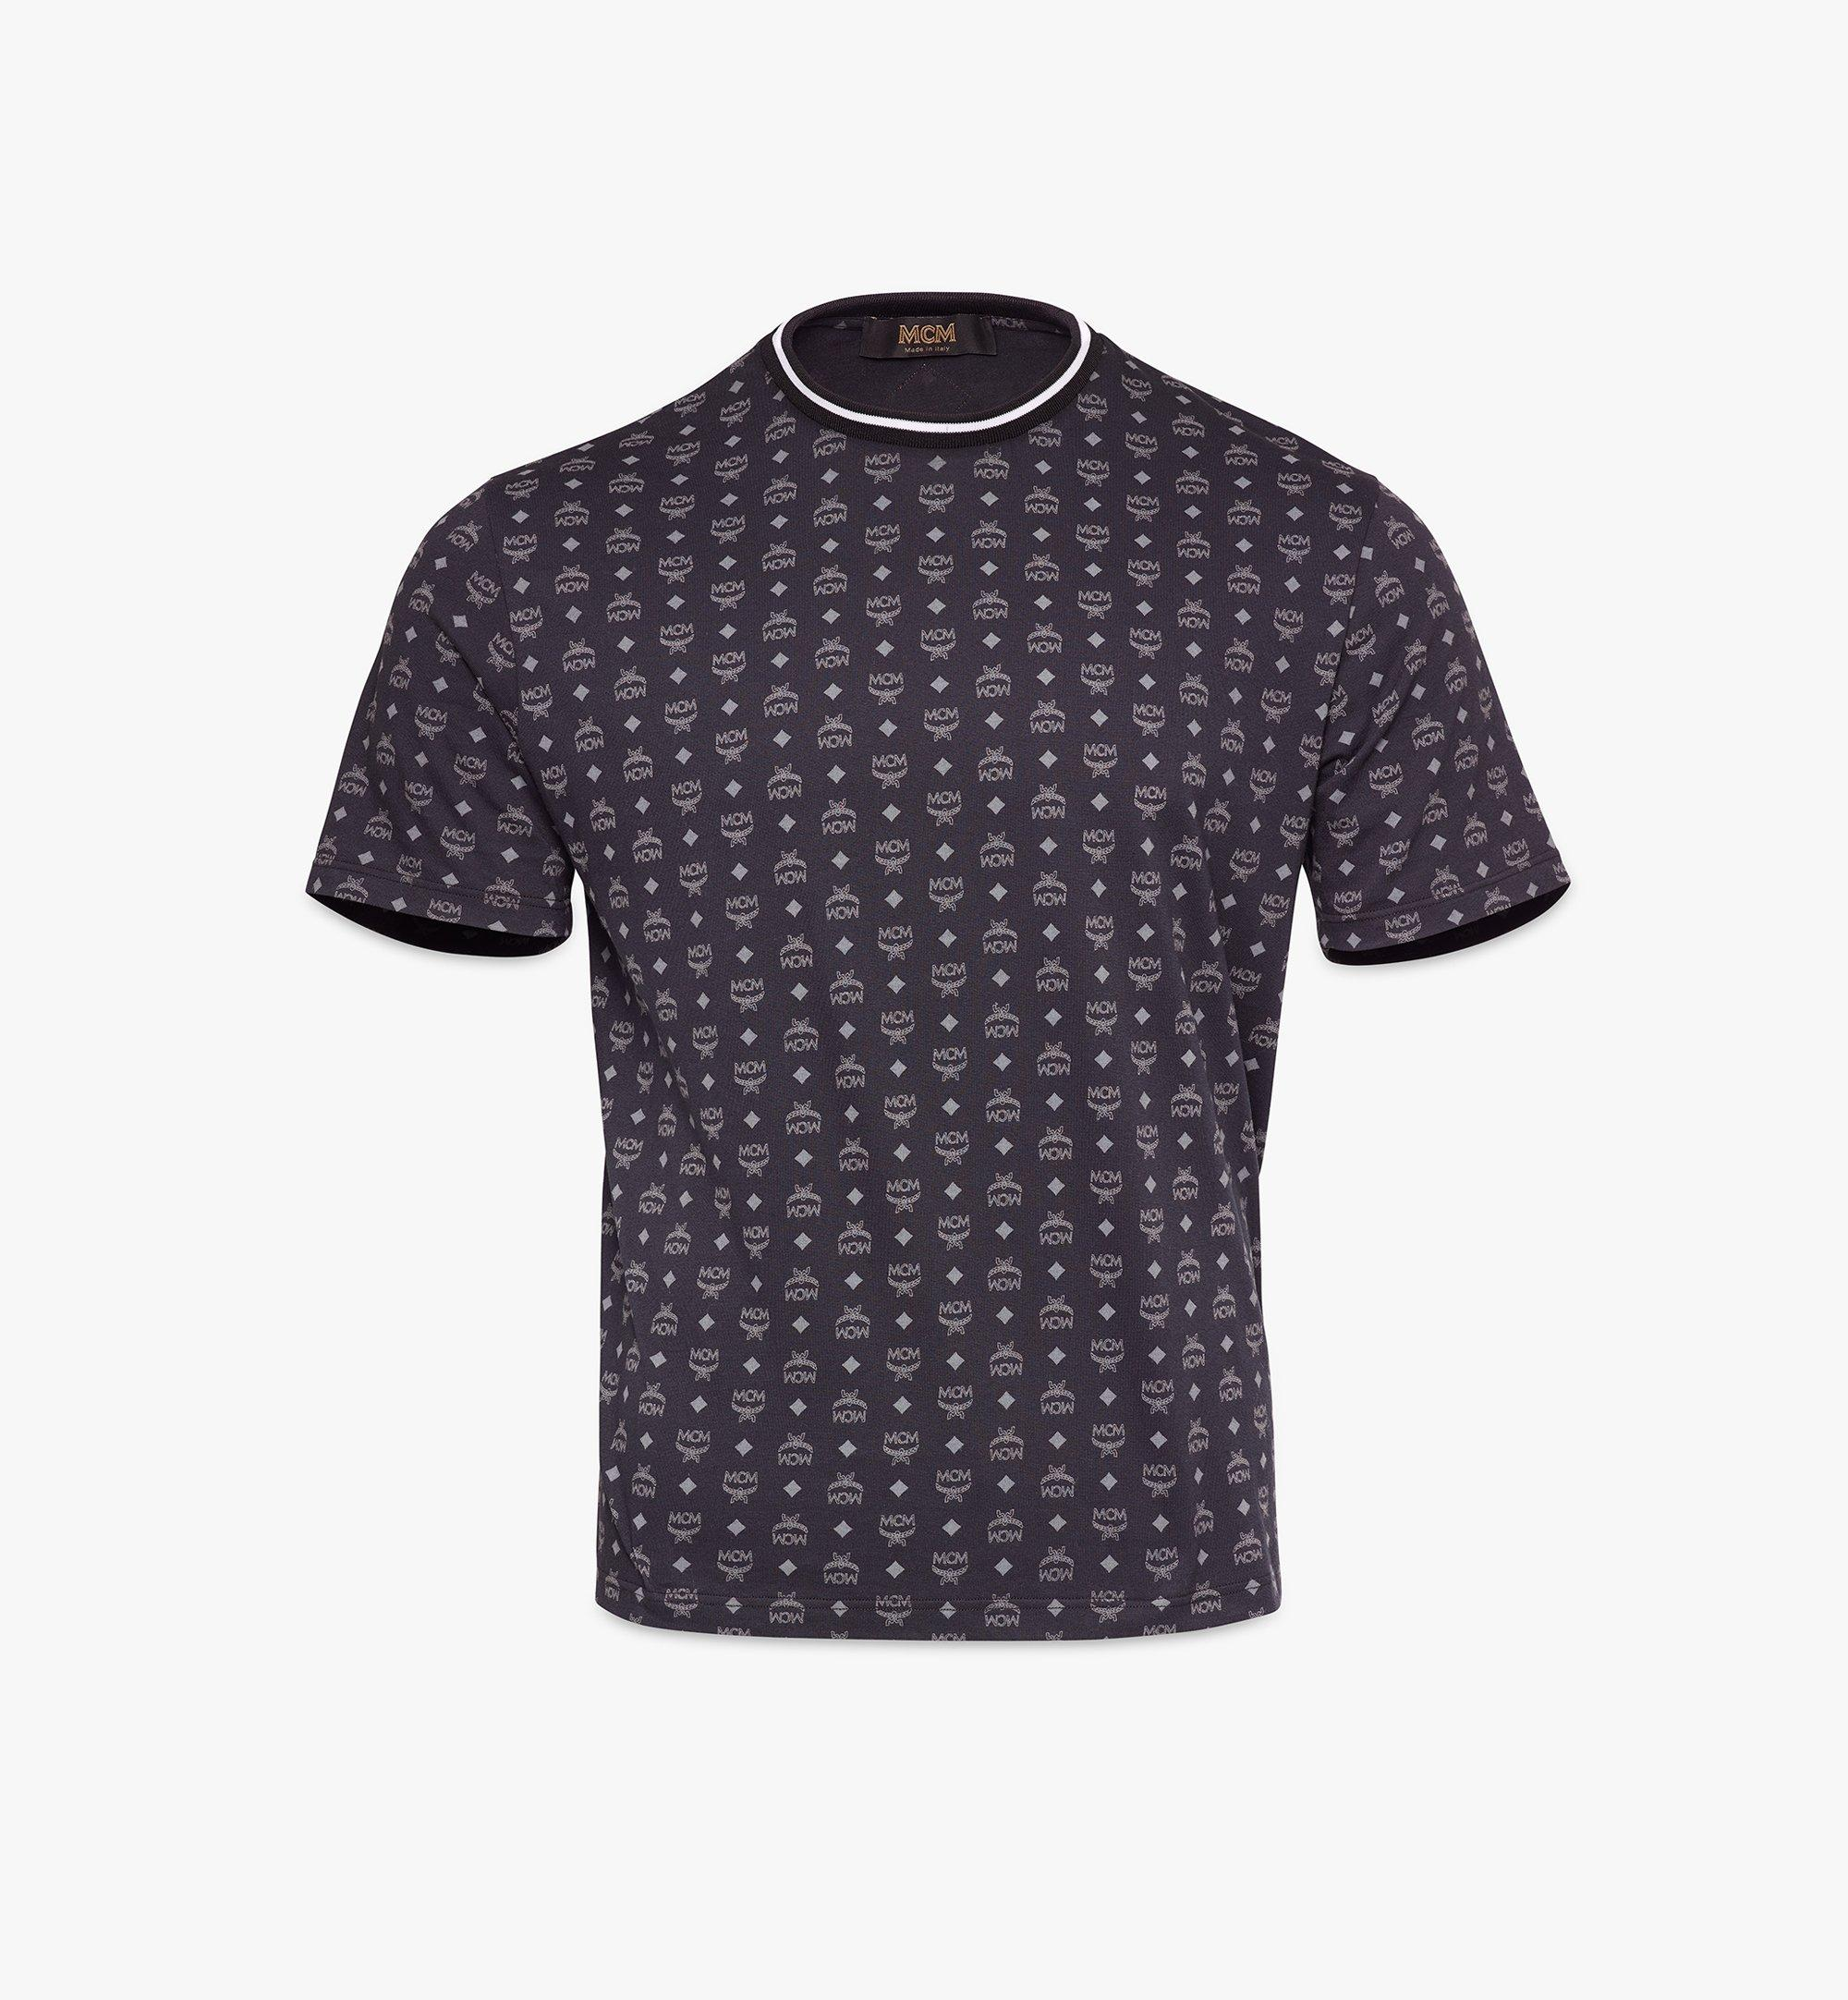 MCM メンズ ヴィセトスプリント Tシャツ Black MHTAAMM05BK00L Alternate View 1